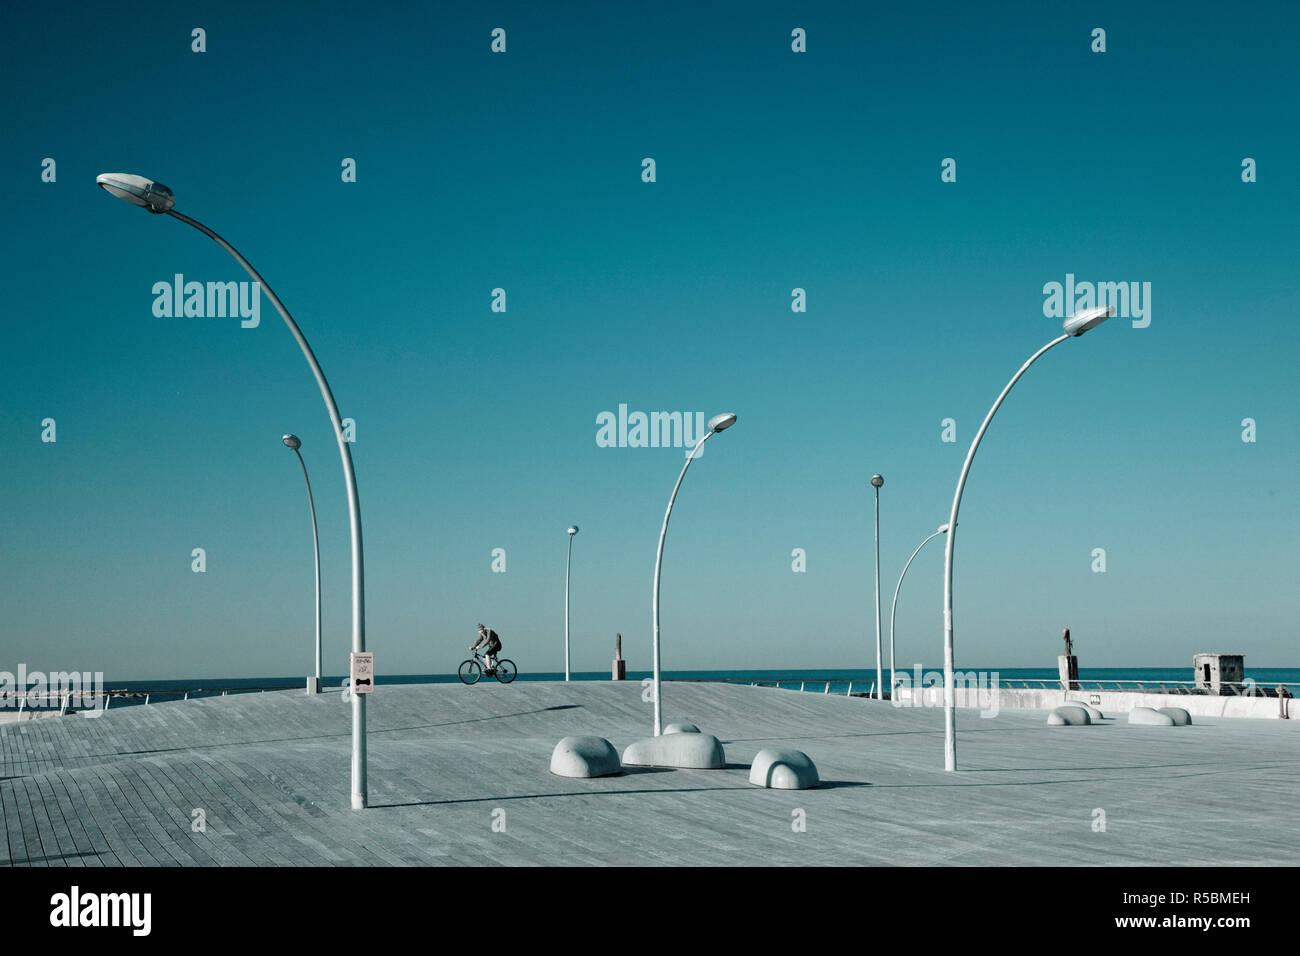 Israel, Tel Aviv, Old Port, Namal, renovated port now home to shops and cafes, boardwalk - Stock Image